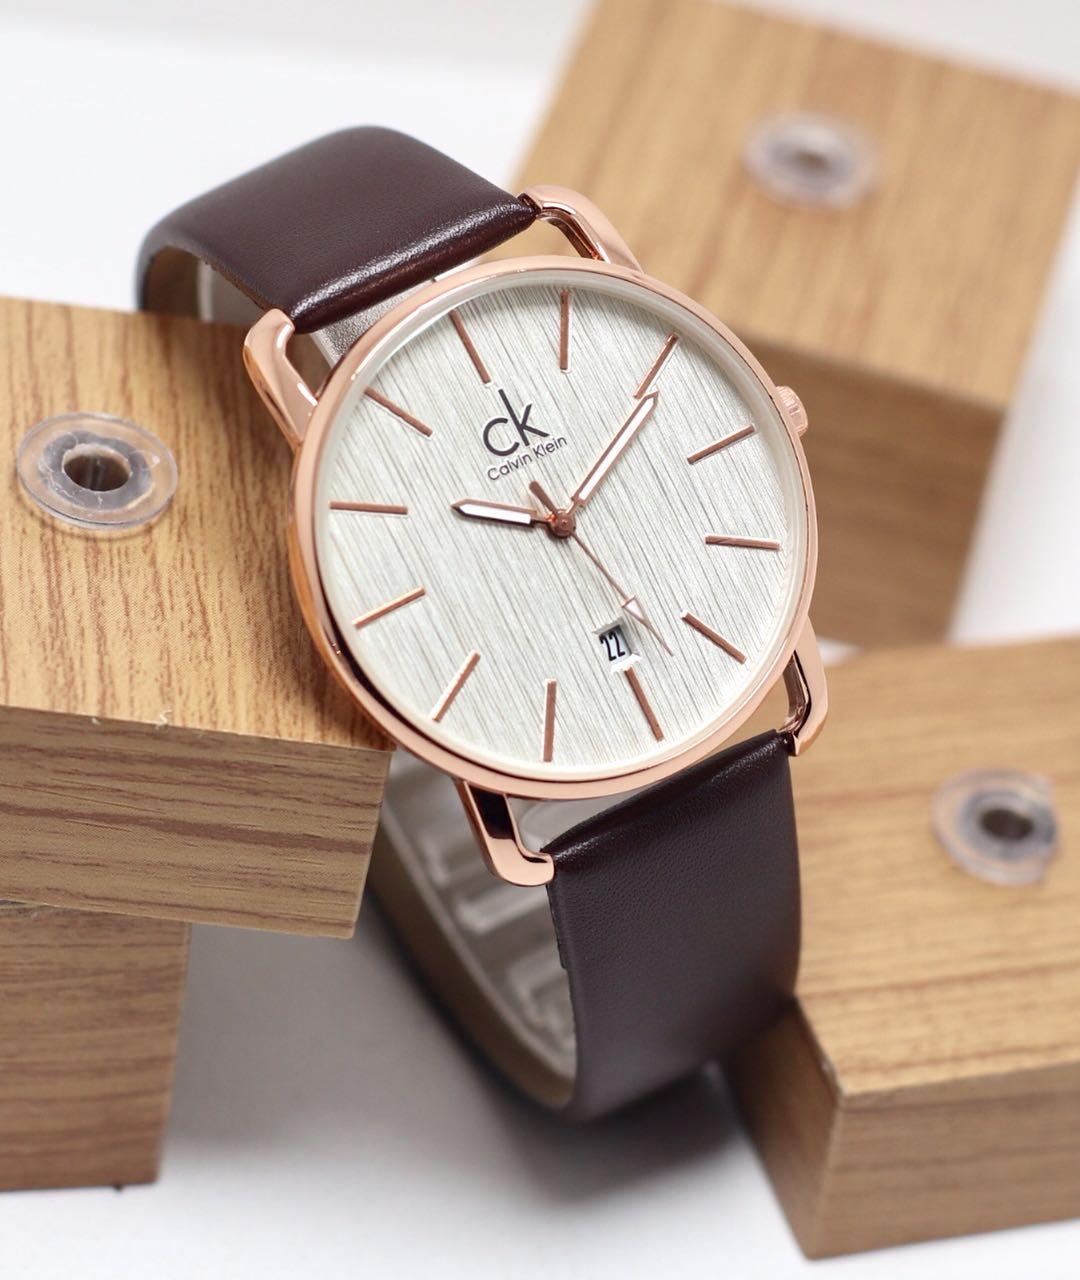 Calvin klein jam tangan wanita tanggal aktif dapat box